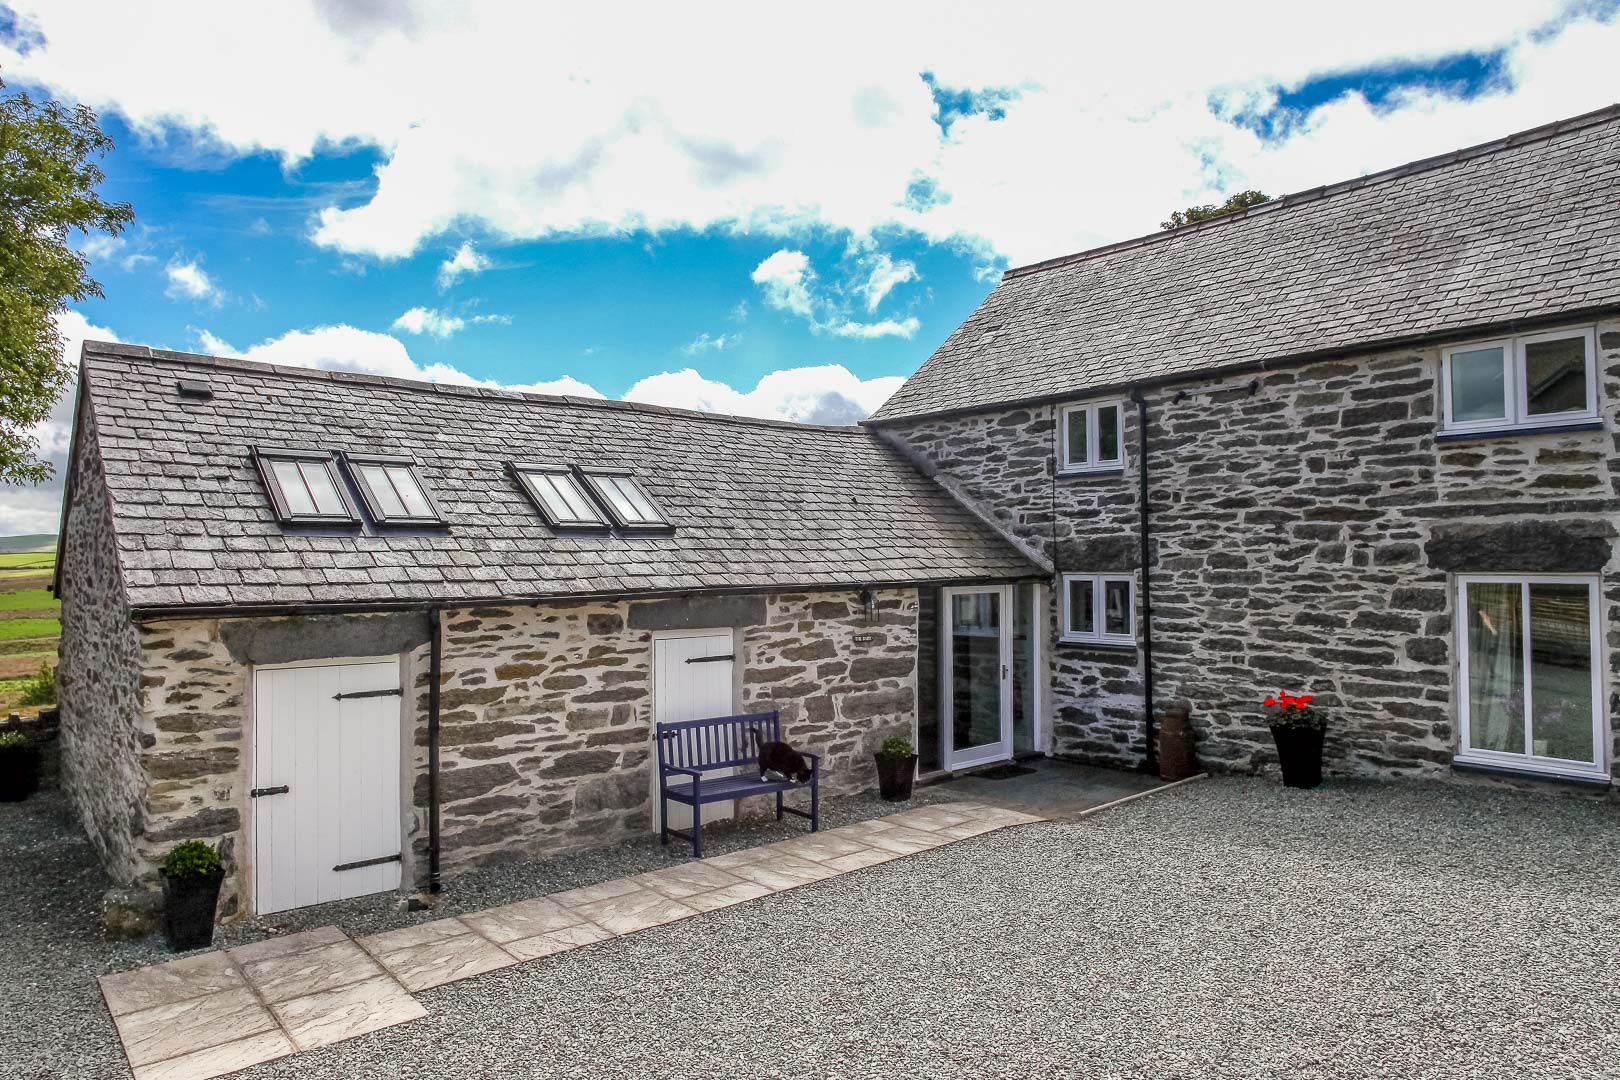 Rural Three Bedroom Holiday Cottage Near Bala | Llaethdy-Wen